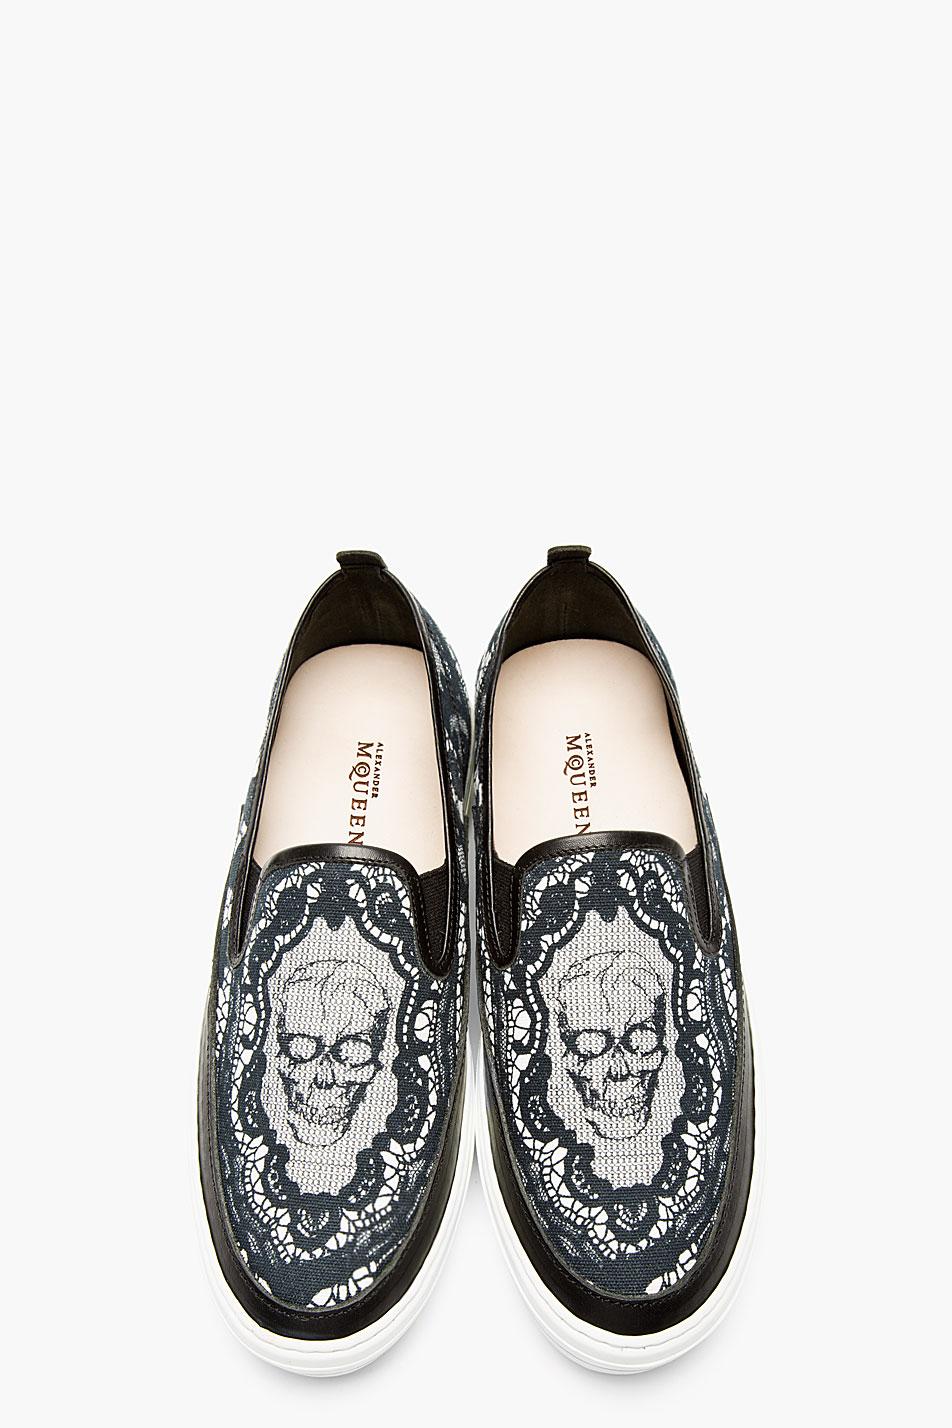 Skull Shoes Canada